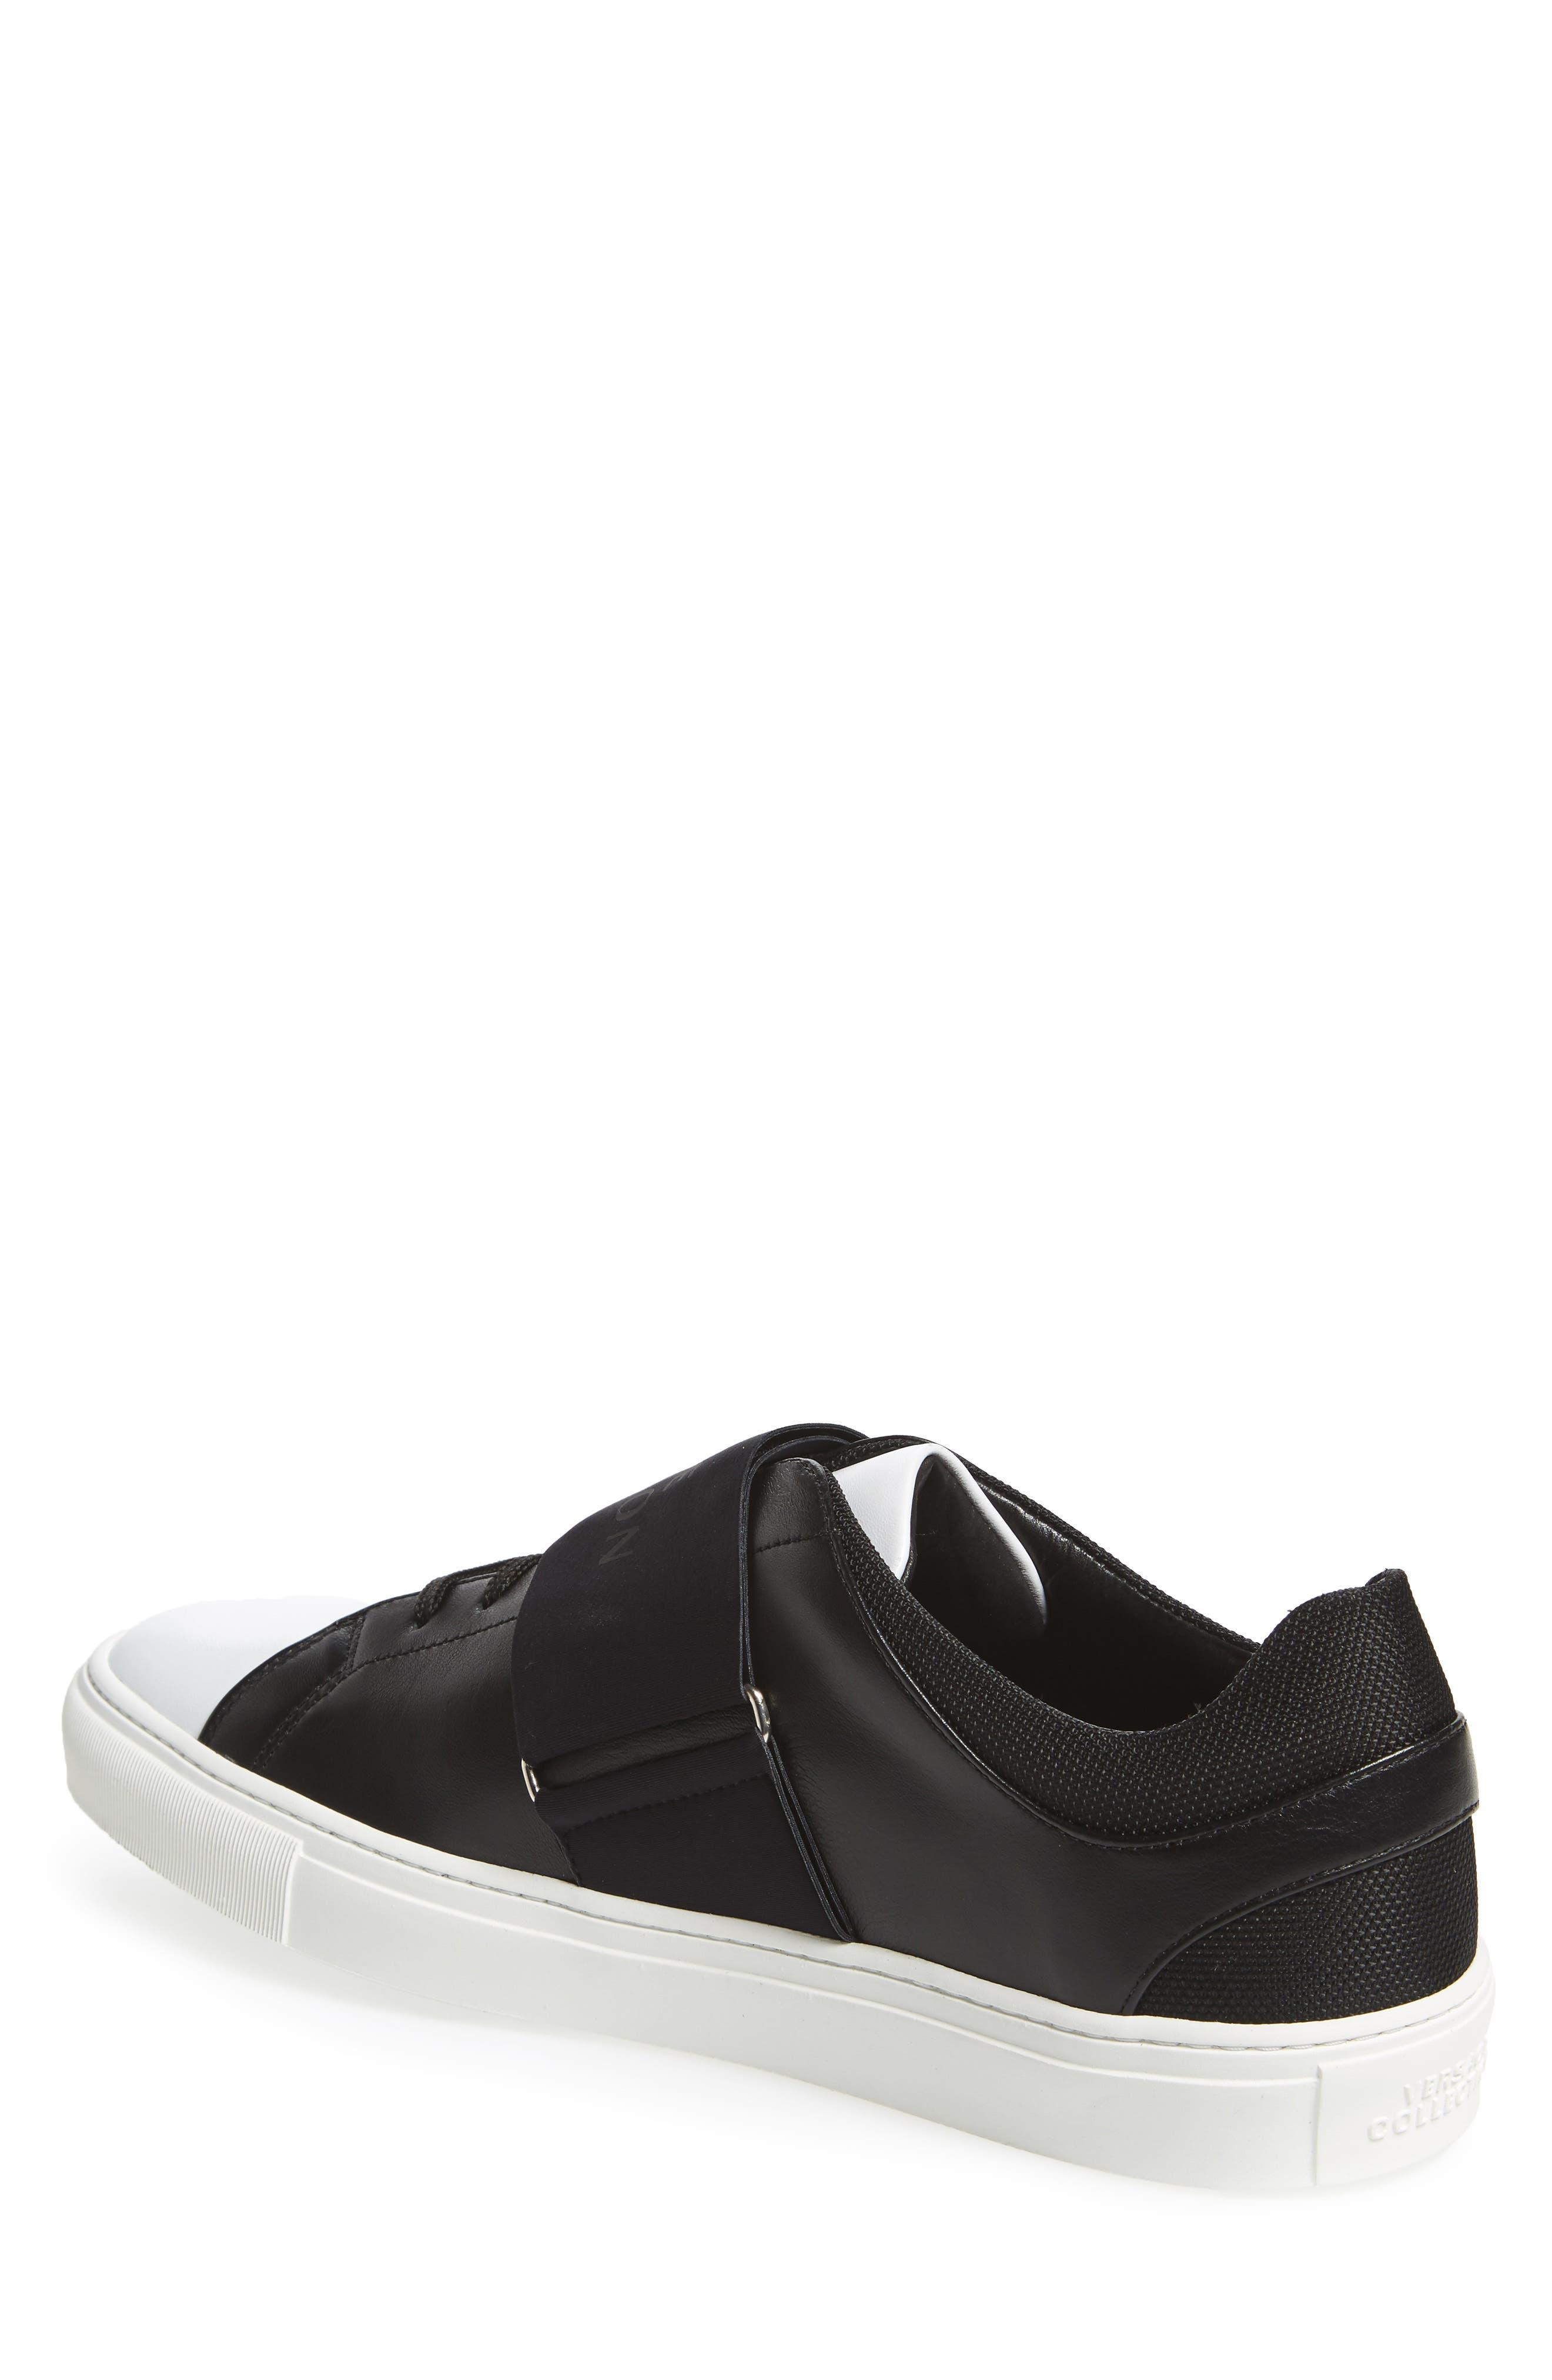 Strap Sneaker,                             Alternate thumbnail 2, color,                             Bianco/ Nero Leather